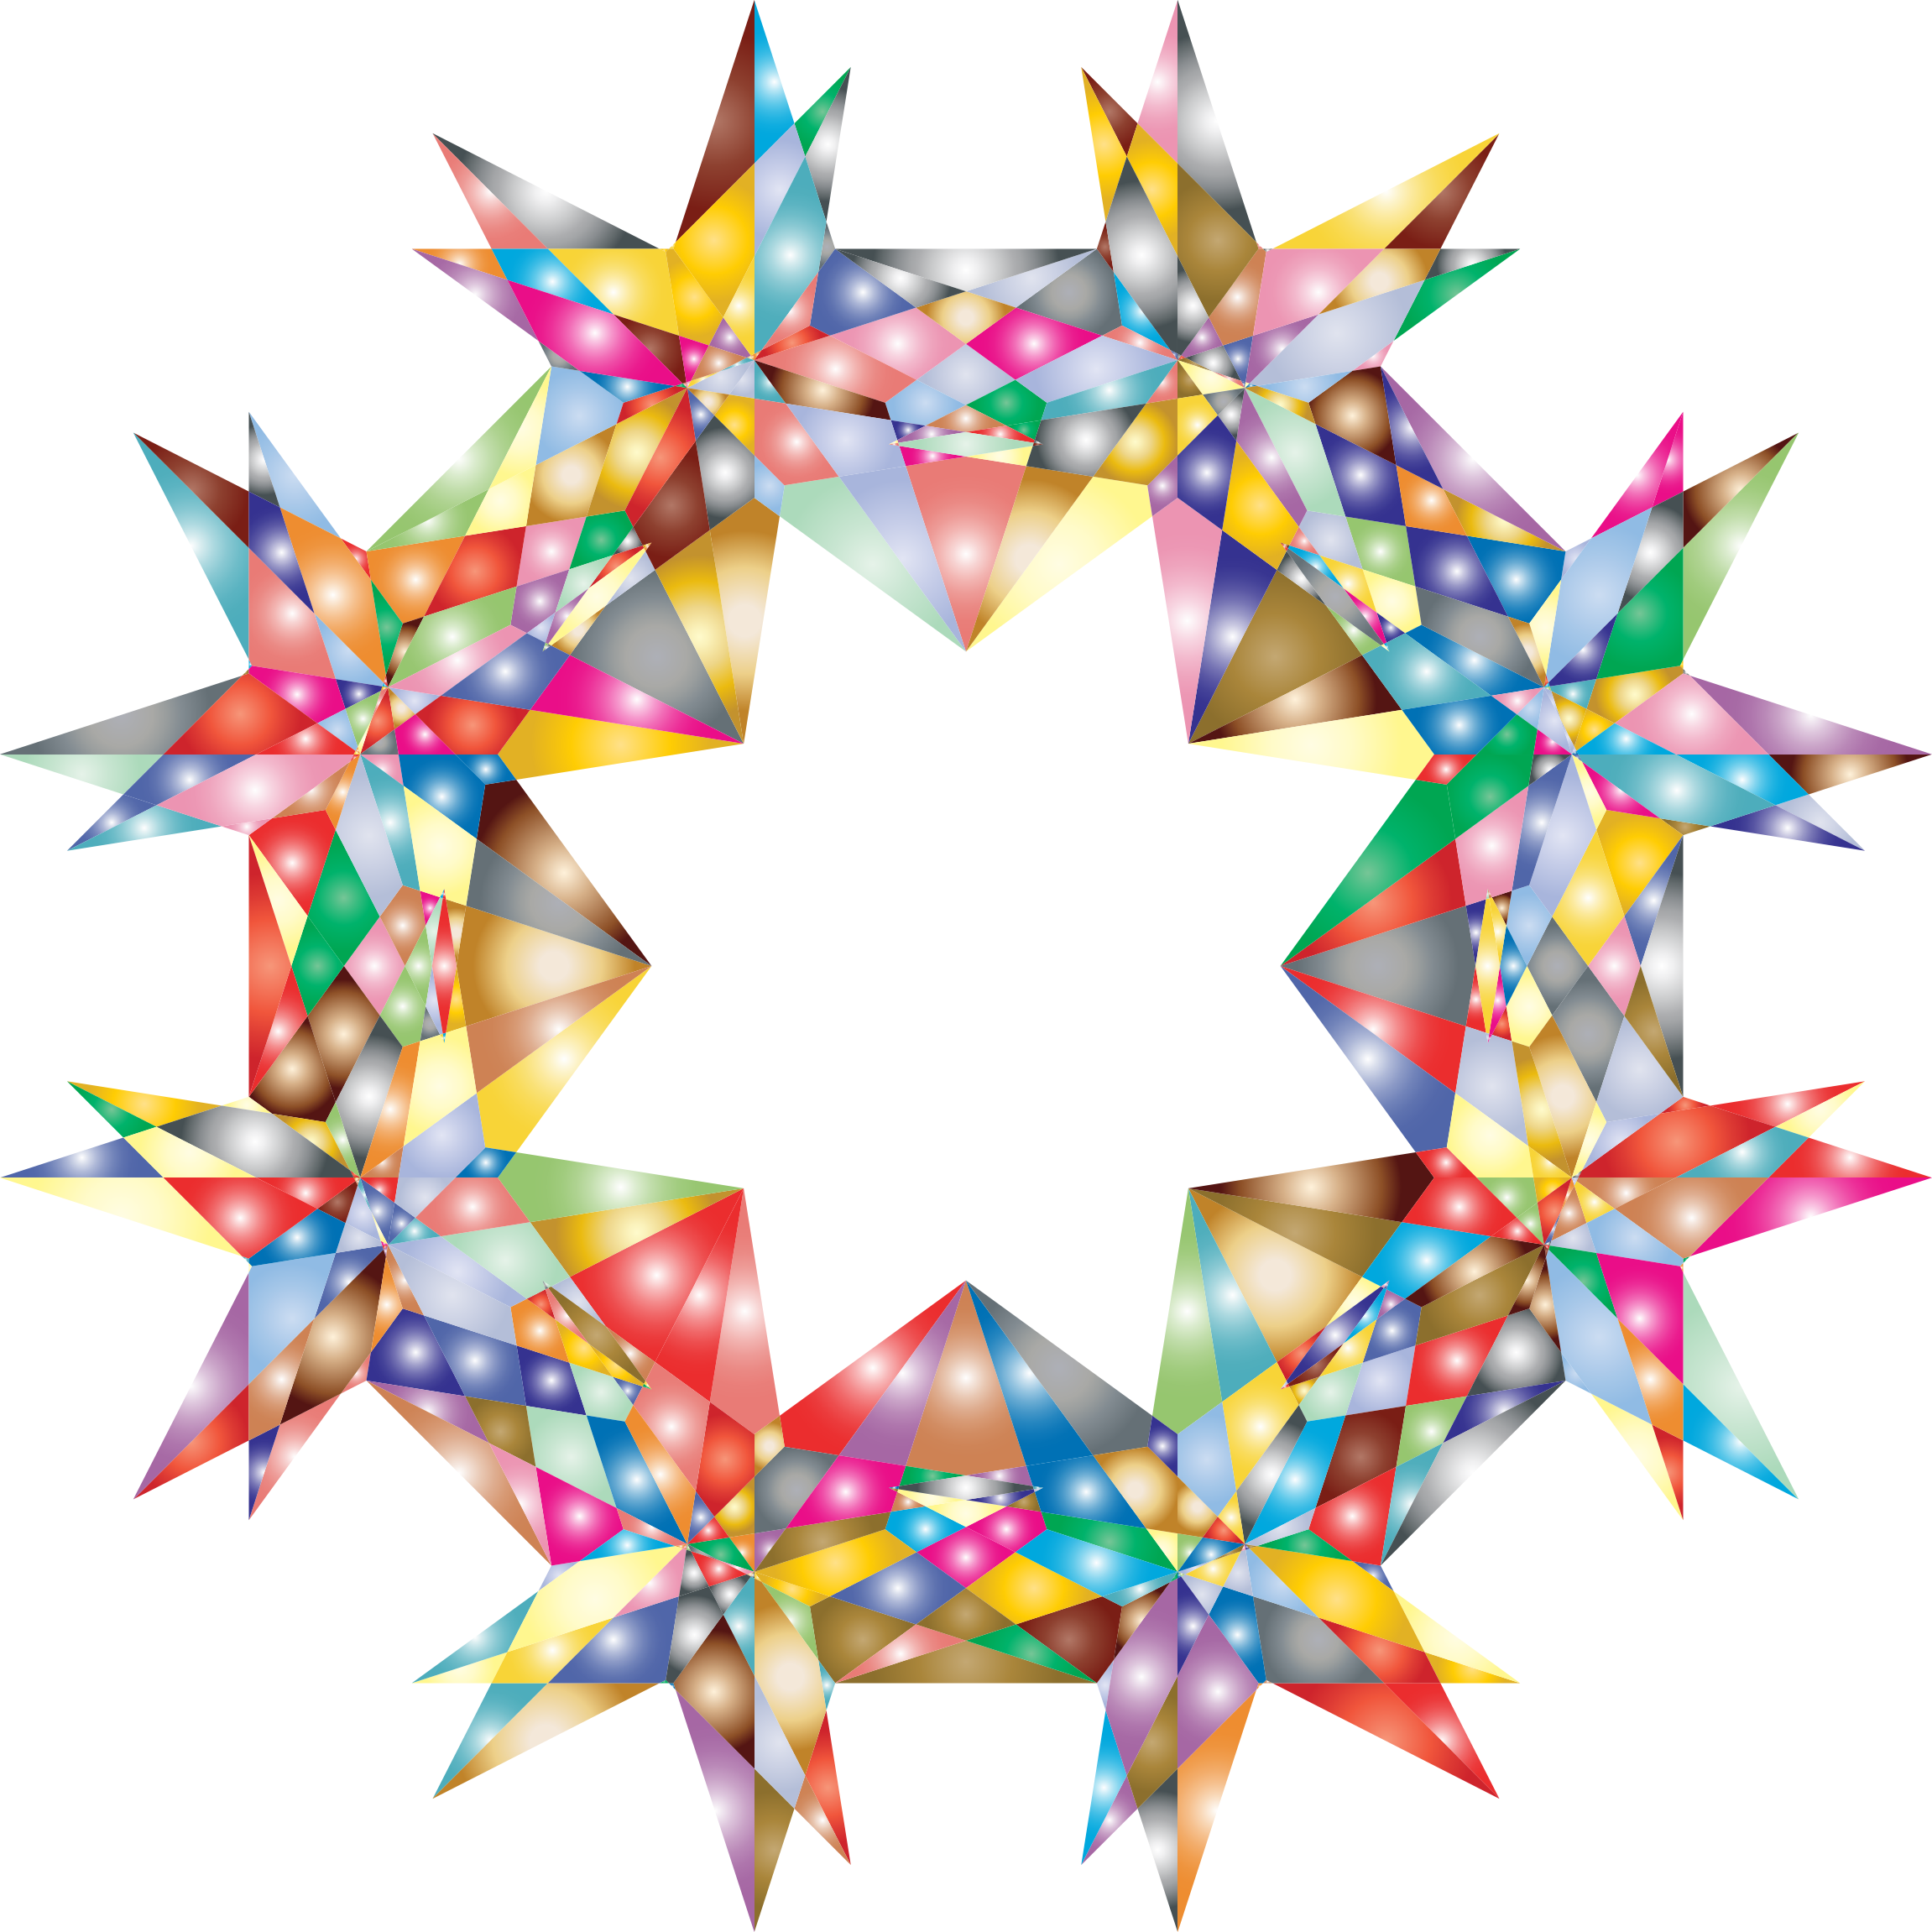 banner transparent download Colorful geometric big image. 7 clipart 7 star